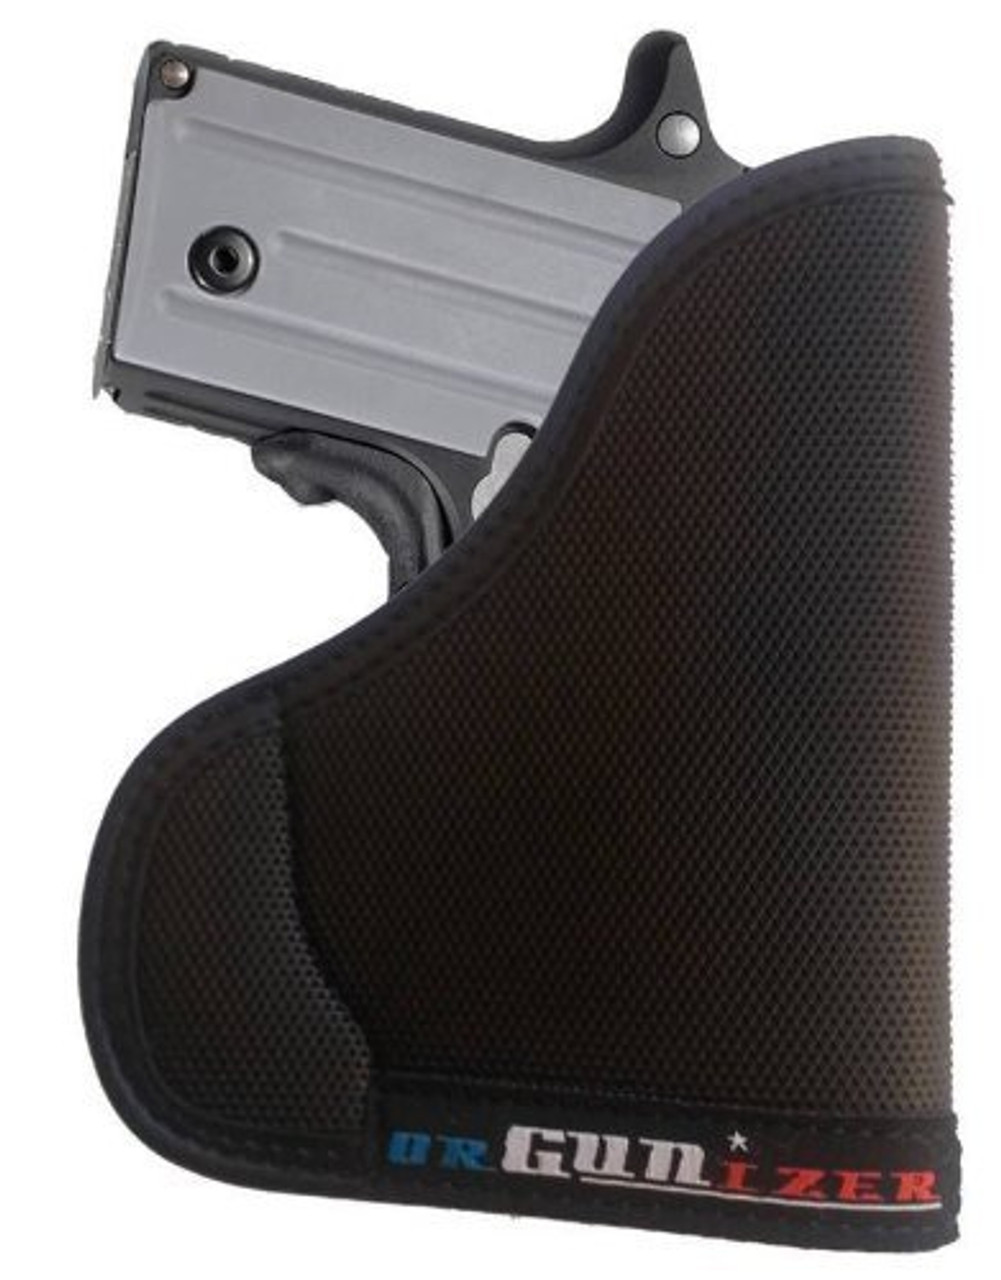 Garrison Grip Custom Fit Leather-Trimmed Pocket Holster Concealed Carry  Comfort, Sig Sauer P238 380 w/Crimson Trace (C)